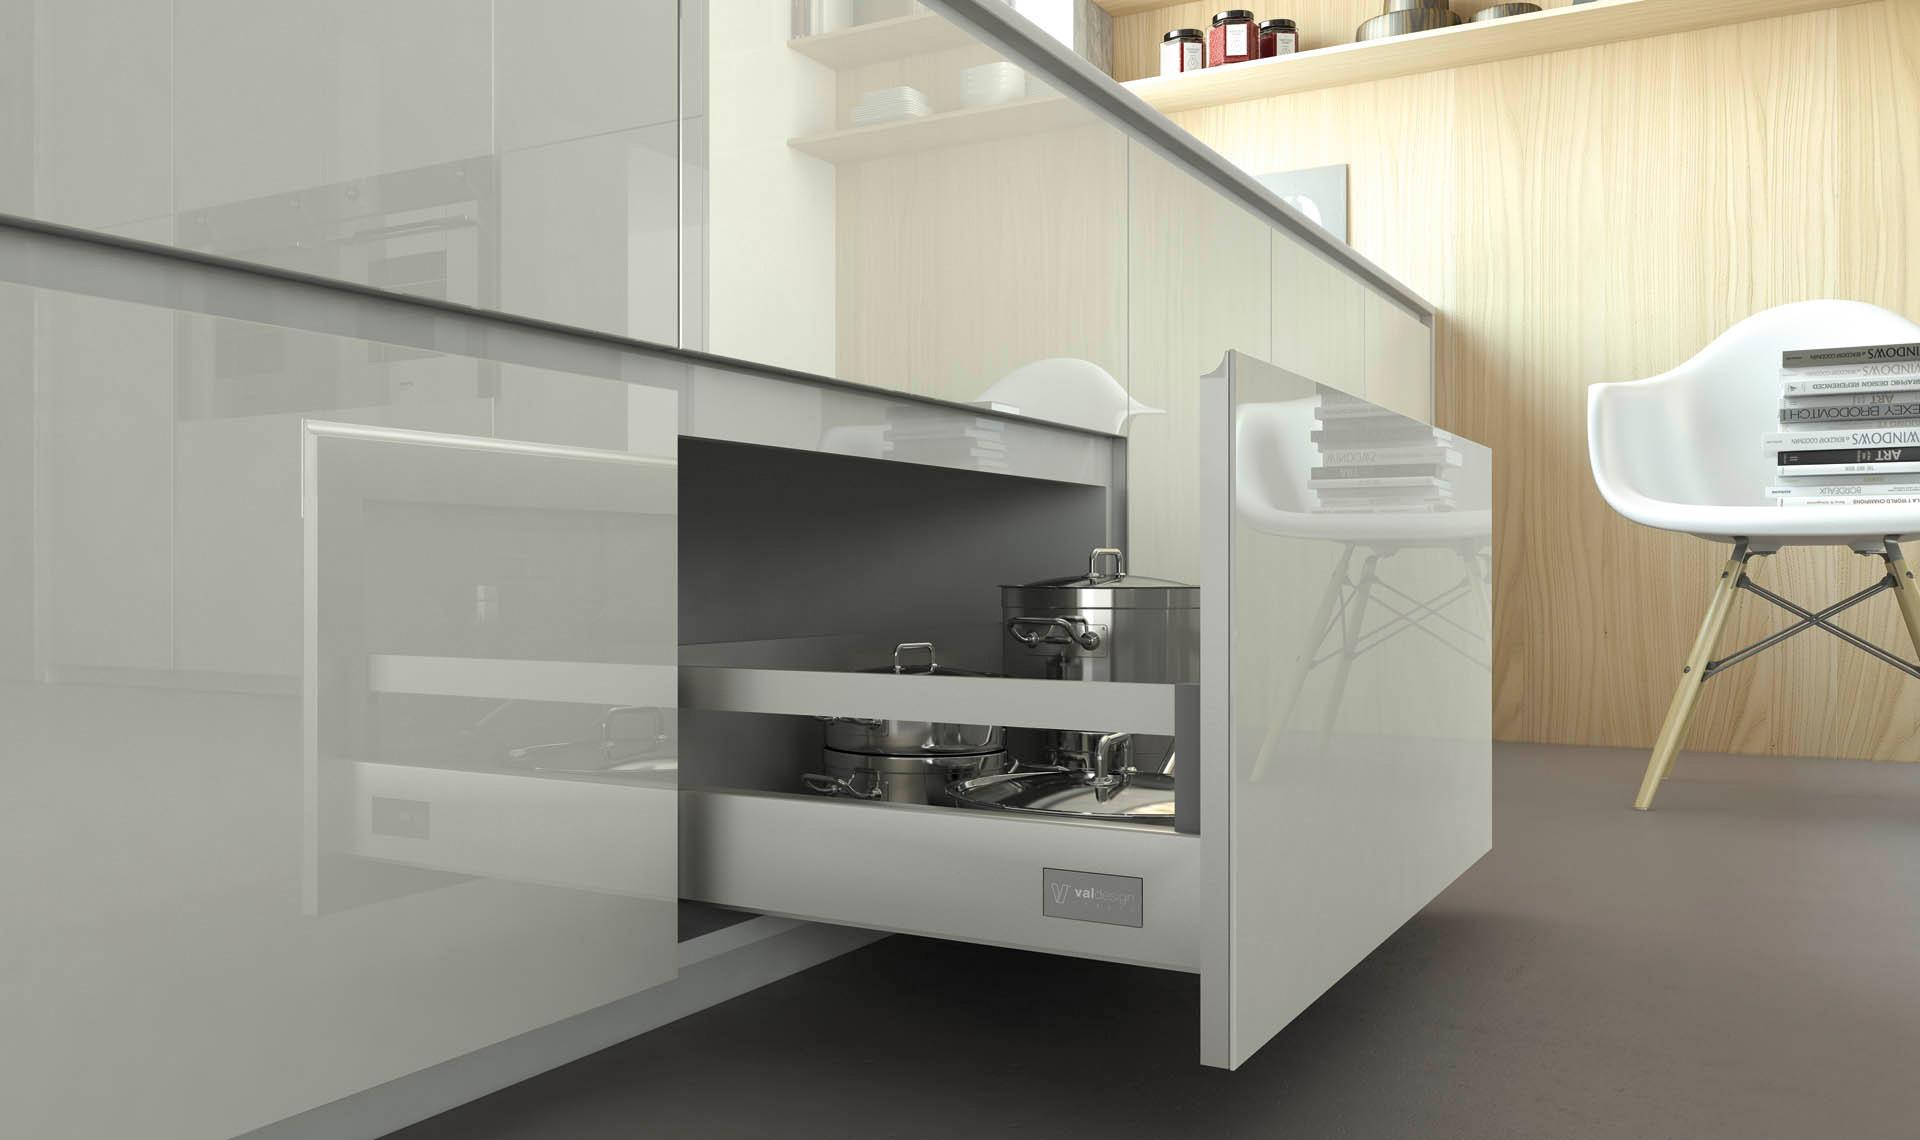 Valdesign realizza cucine moderne cucine moderne di alta qualit per la tua casa - Vetro per cucina ...